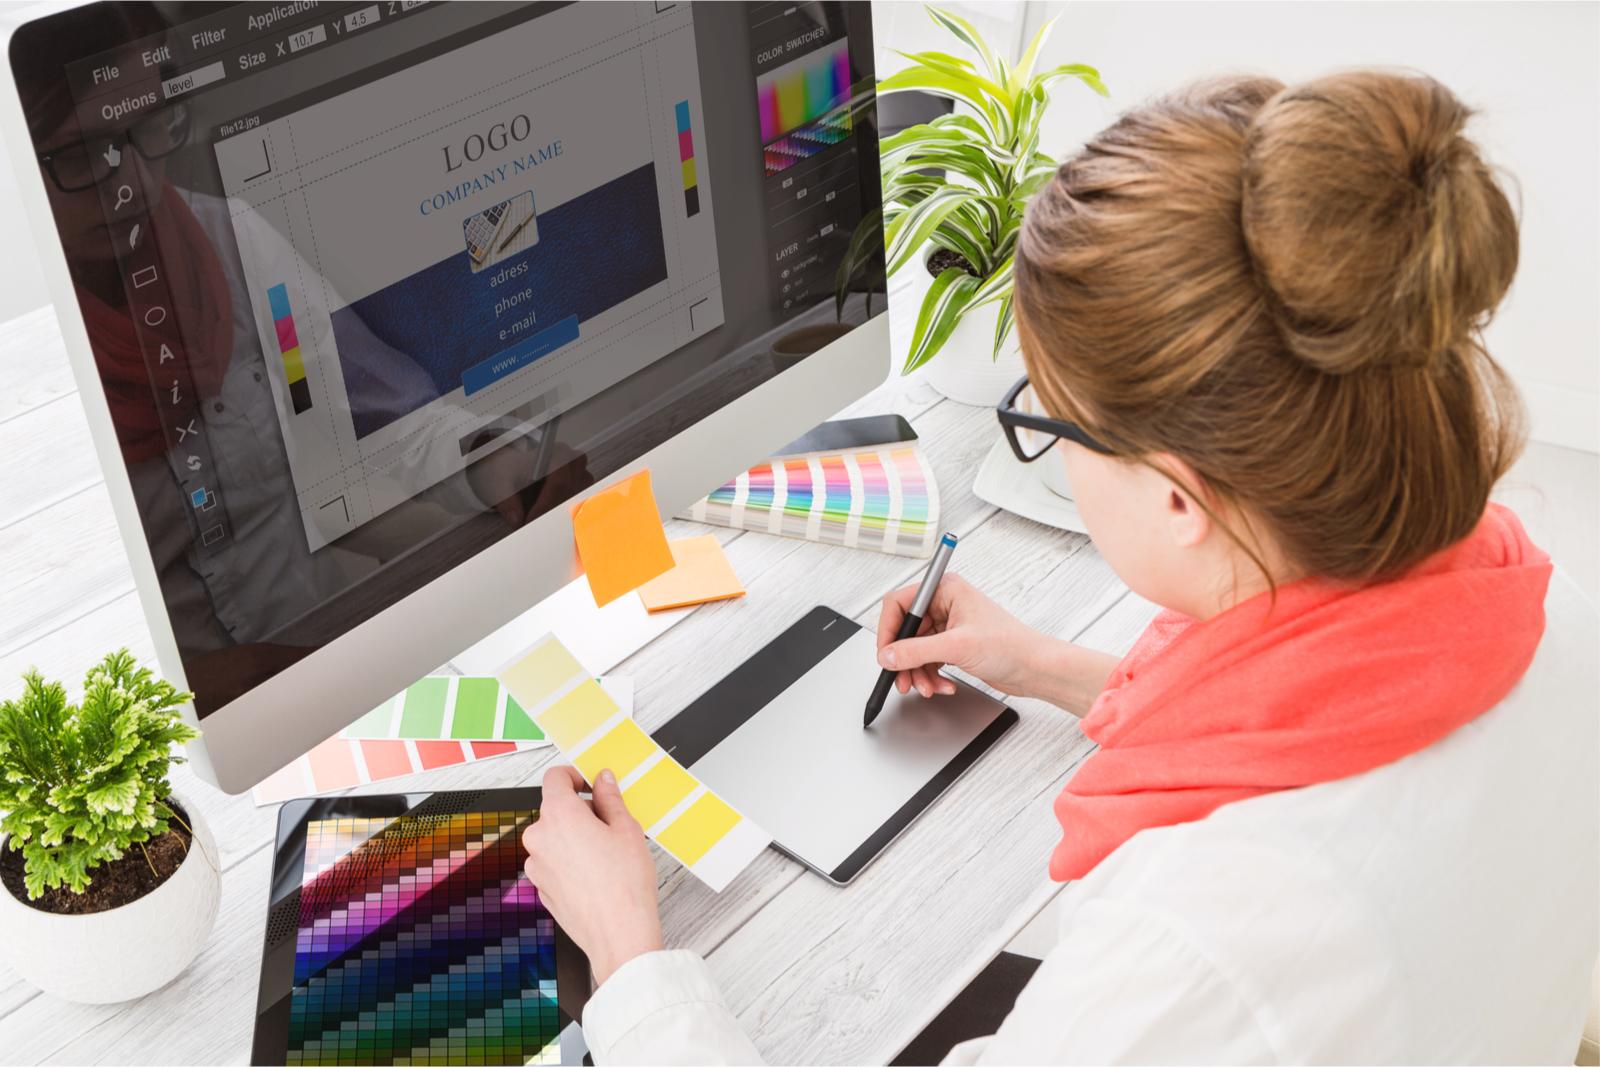 Graphic designer works on a logo